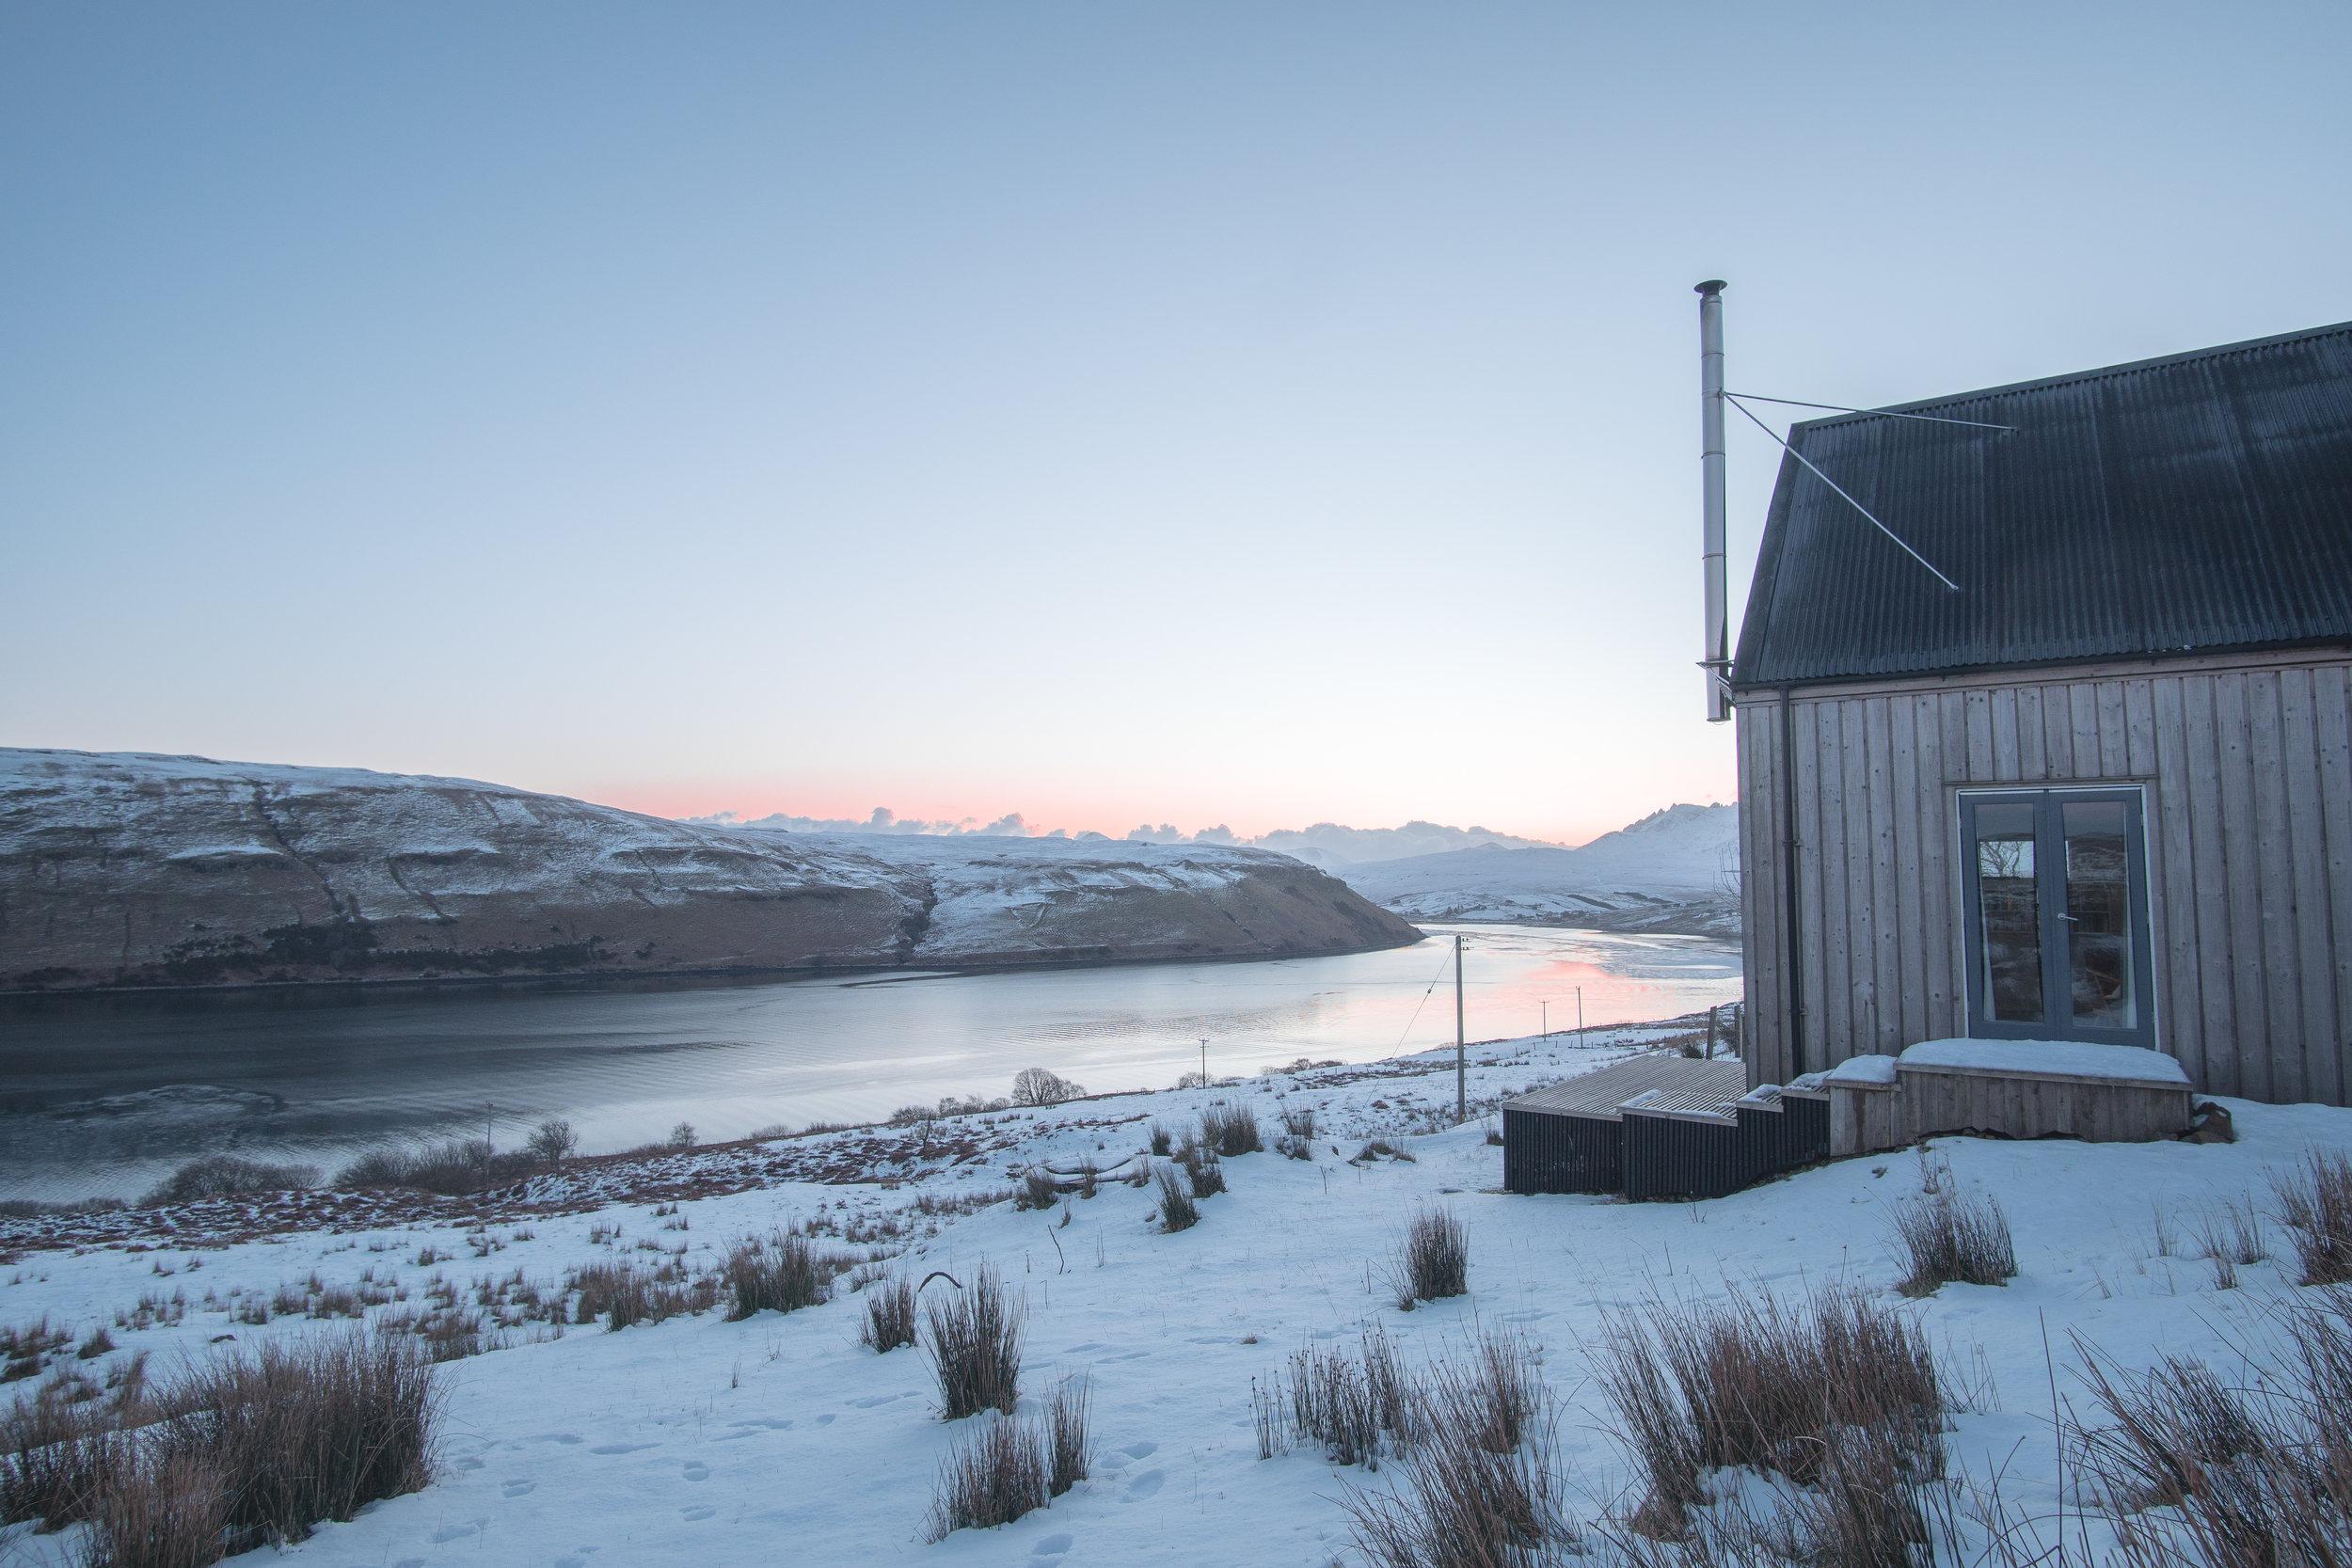 Isle-of-Skye-Winter-2019-Trotternish.jpg